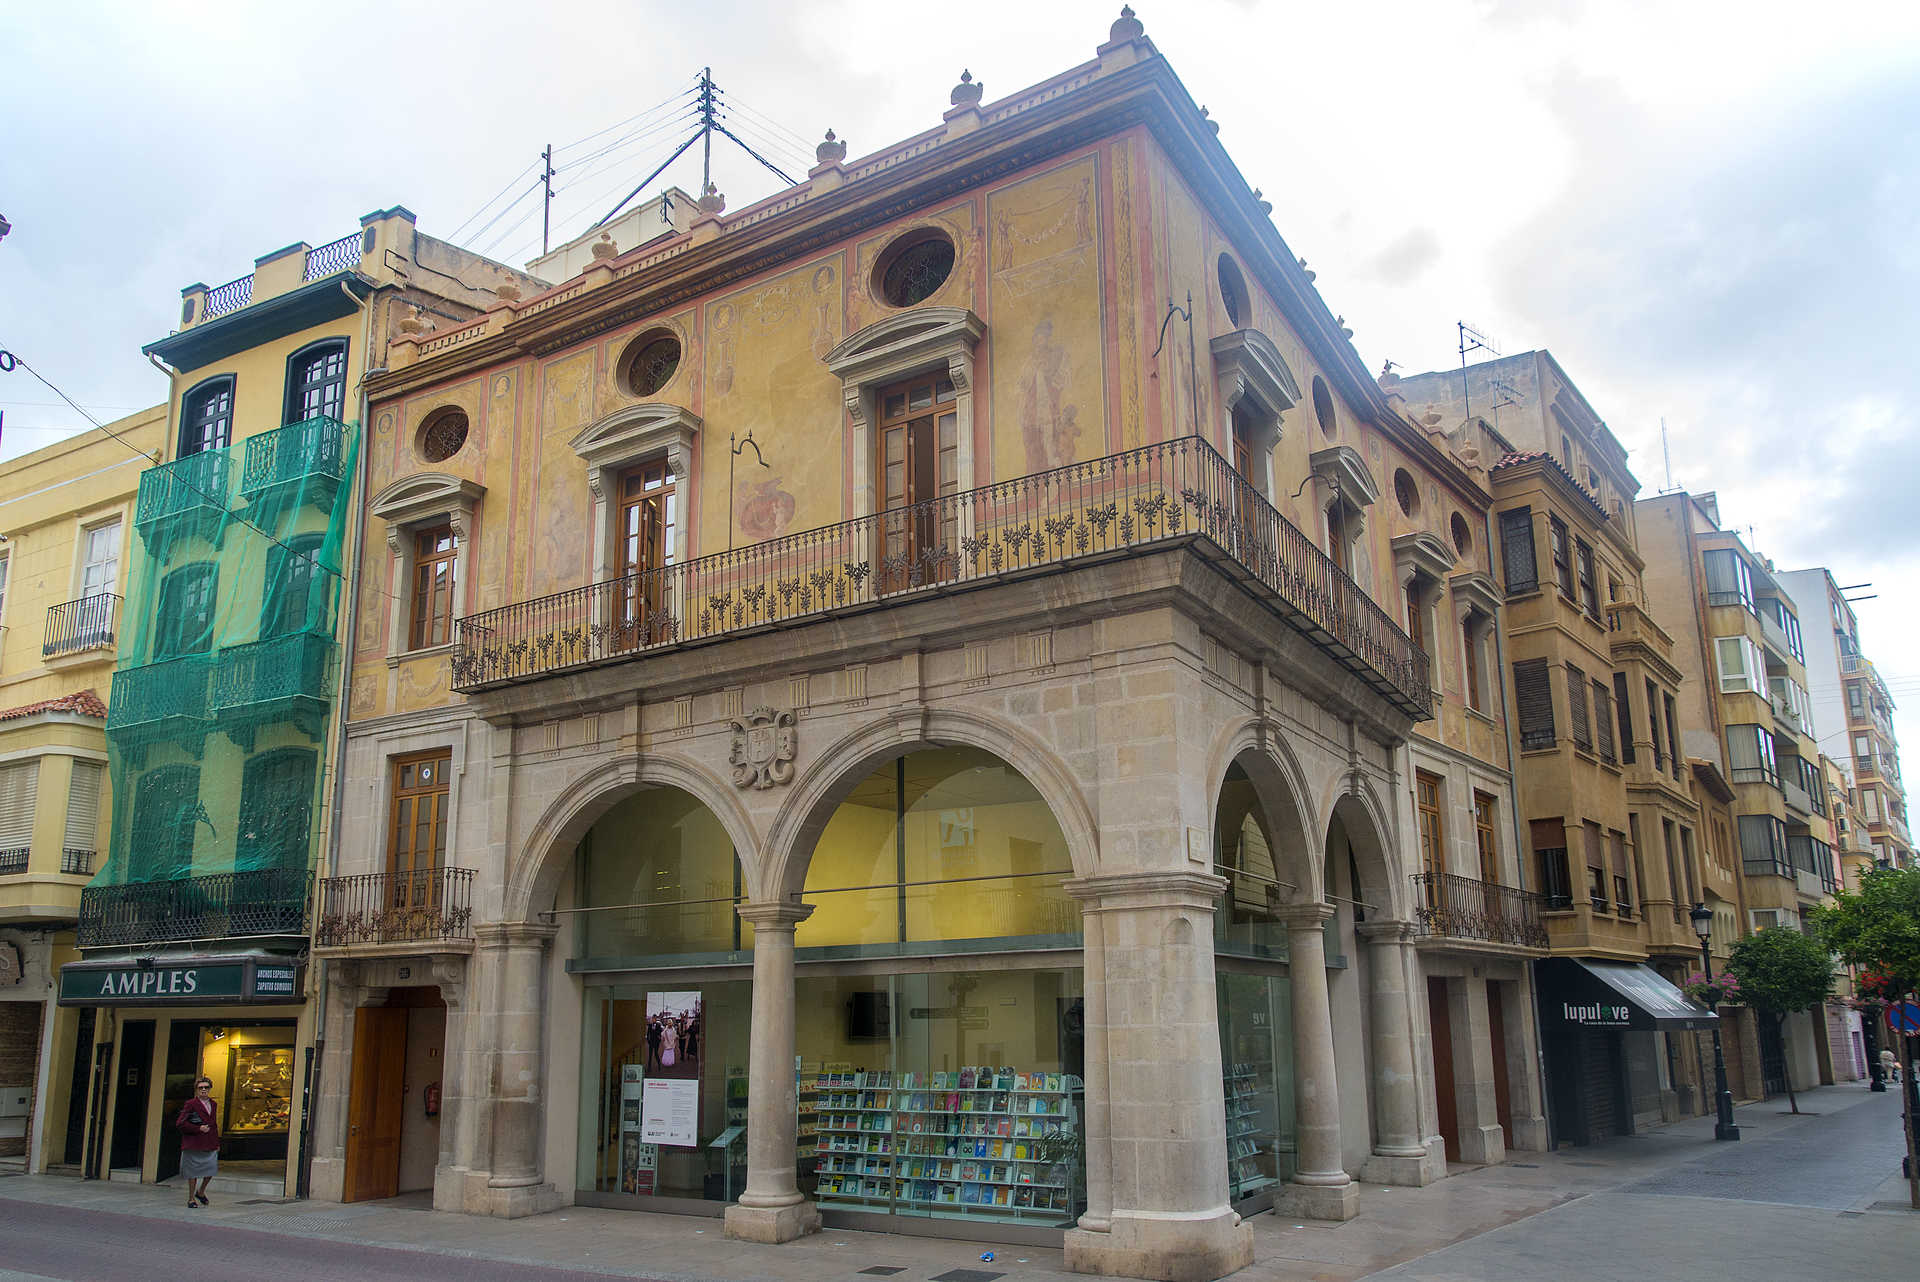 La Lonja del Cáñamo (The Hemp Market)